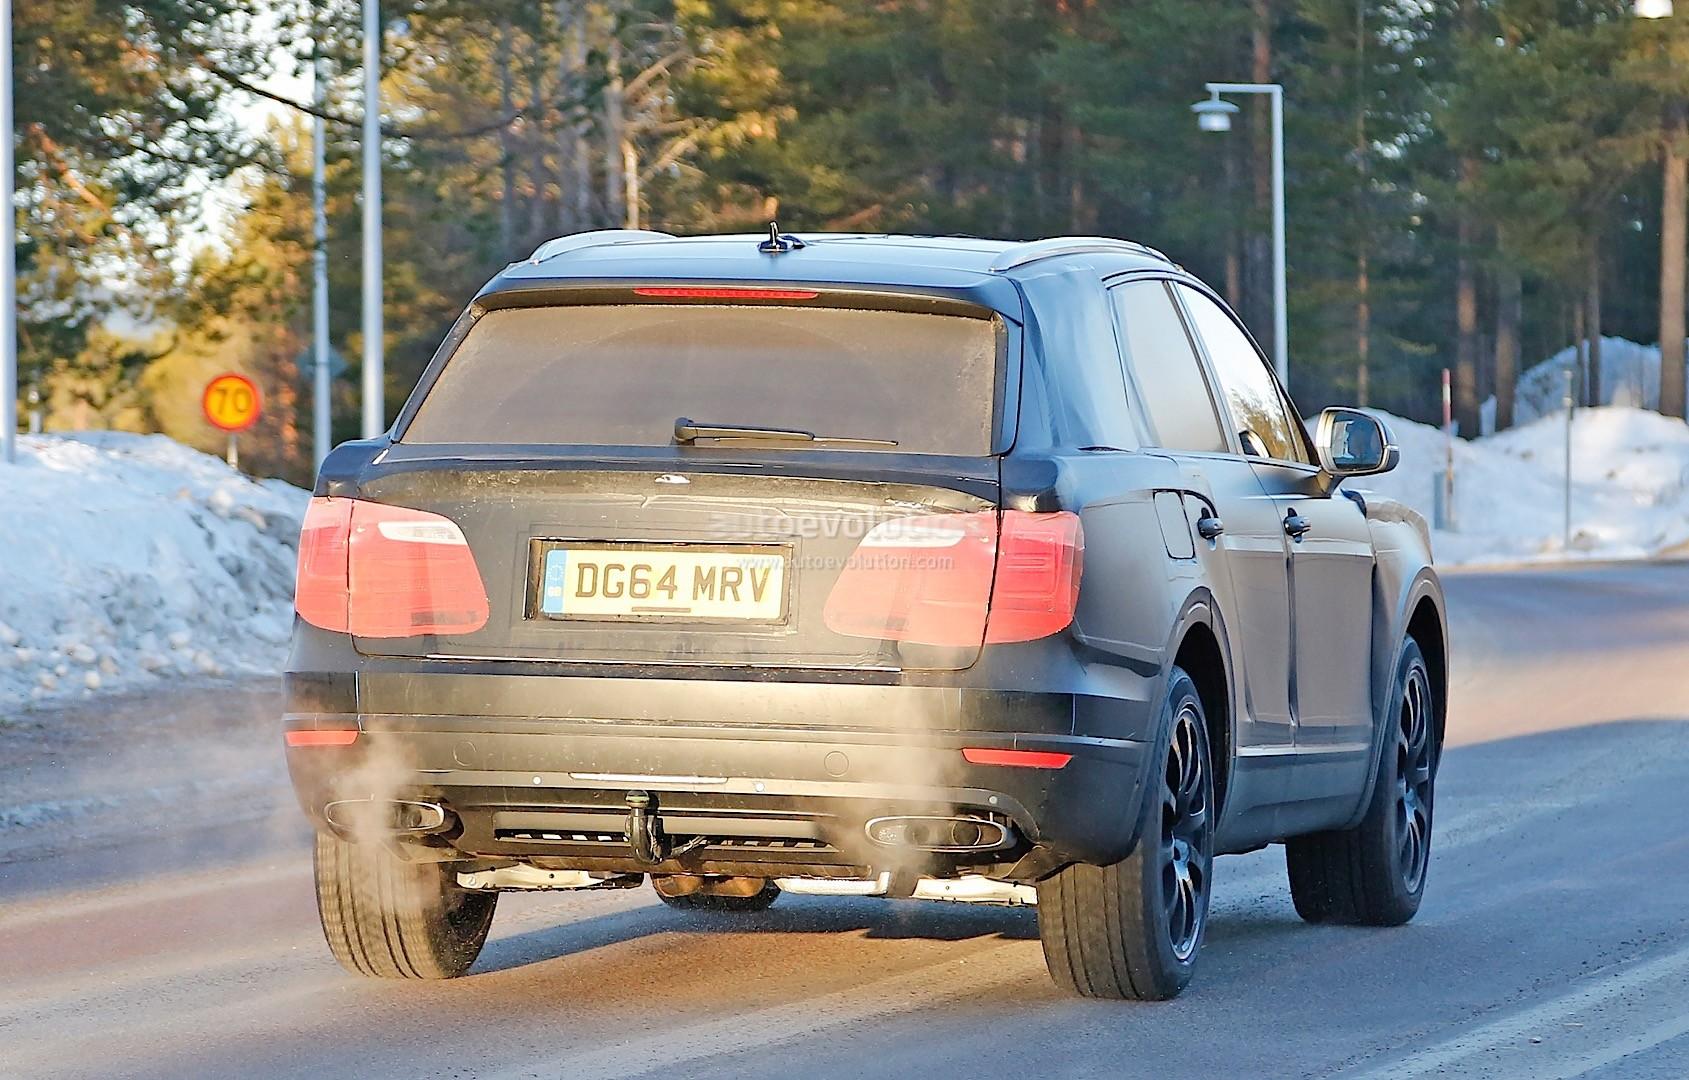 2015 - [Bentley] Bentayga - Page 5 Bentley-bentayga-spied-once-again-looks-like-an-edgier-vw-touareg-photo-gallery_10